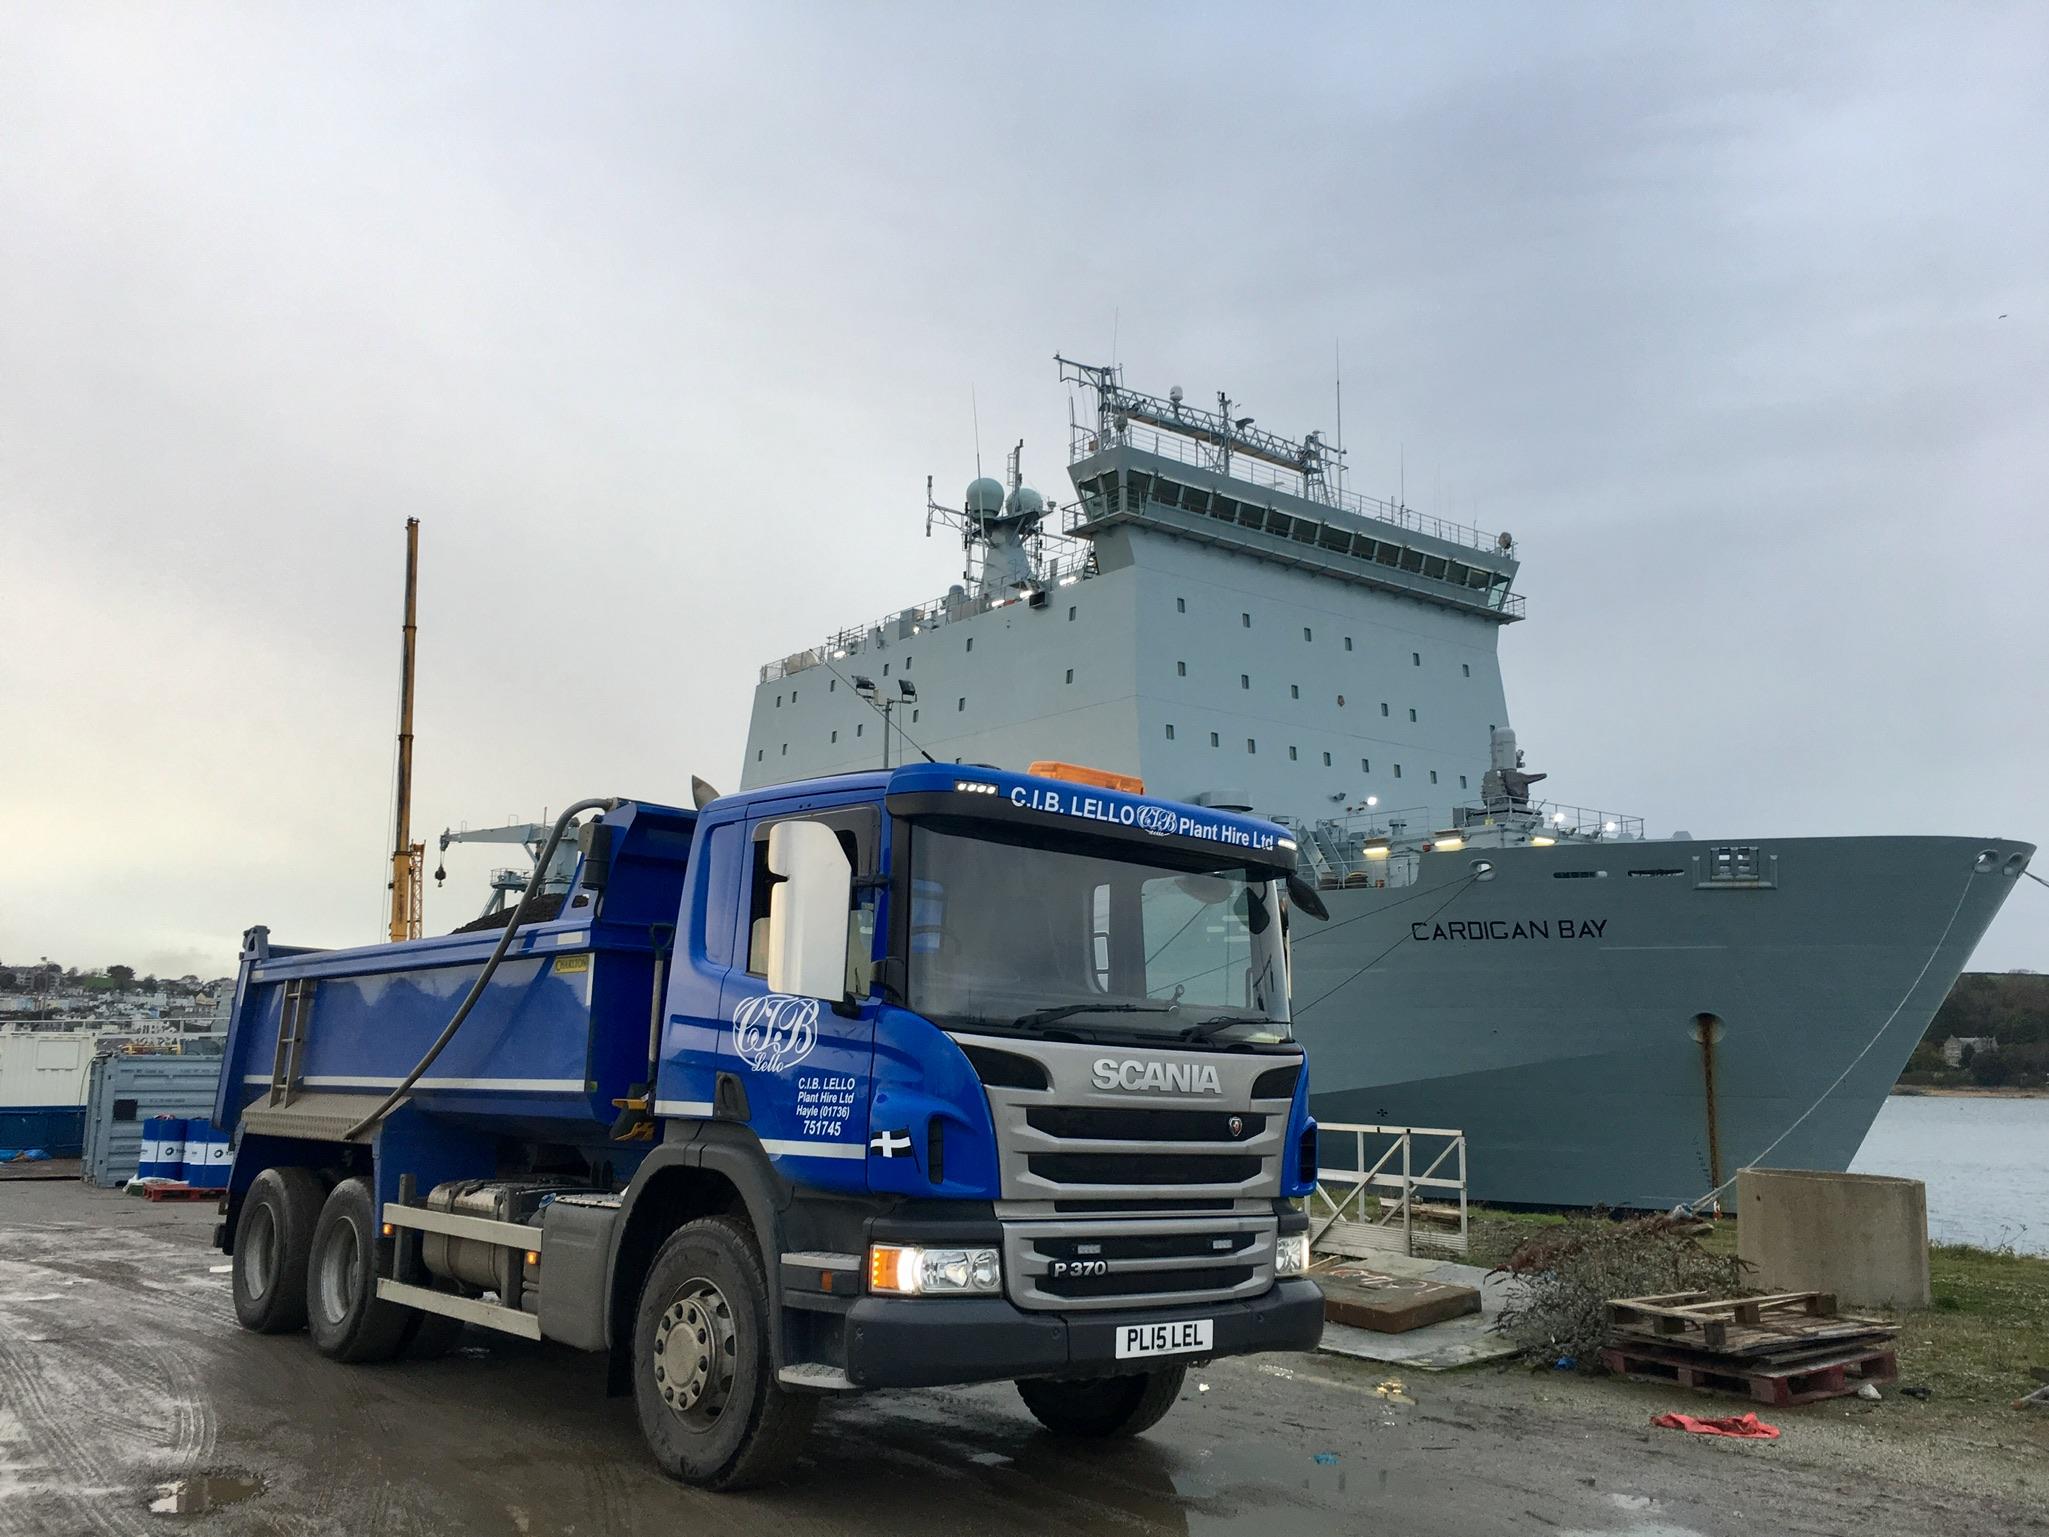 PL15 Falmouth Docks